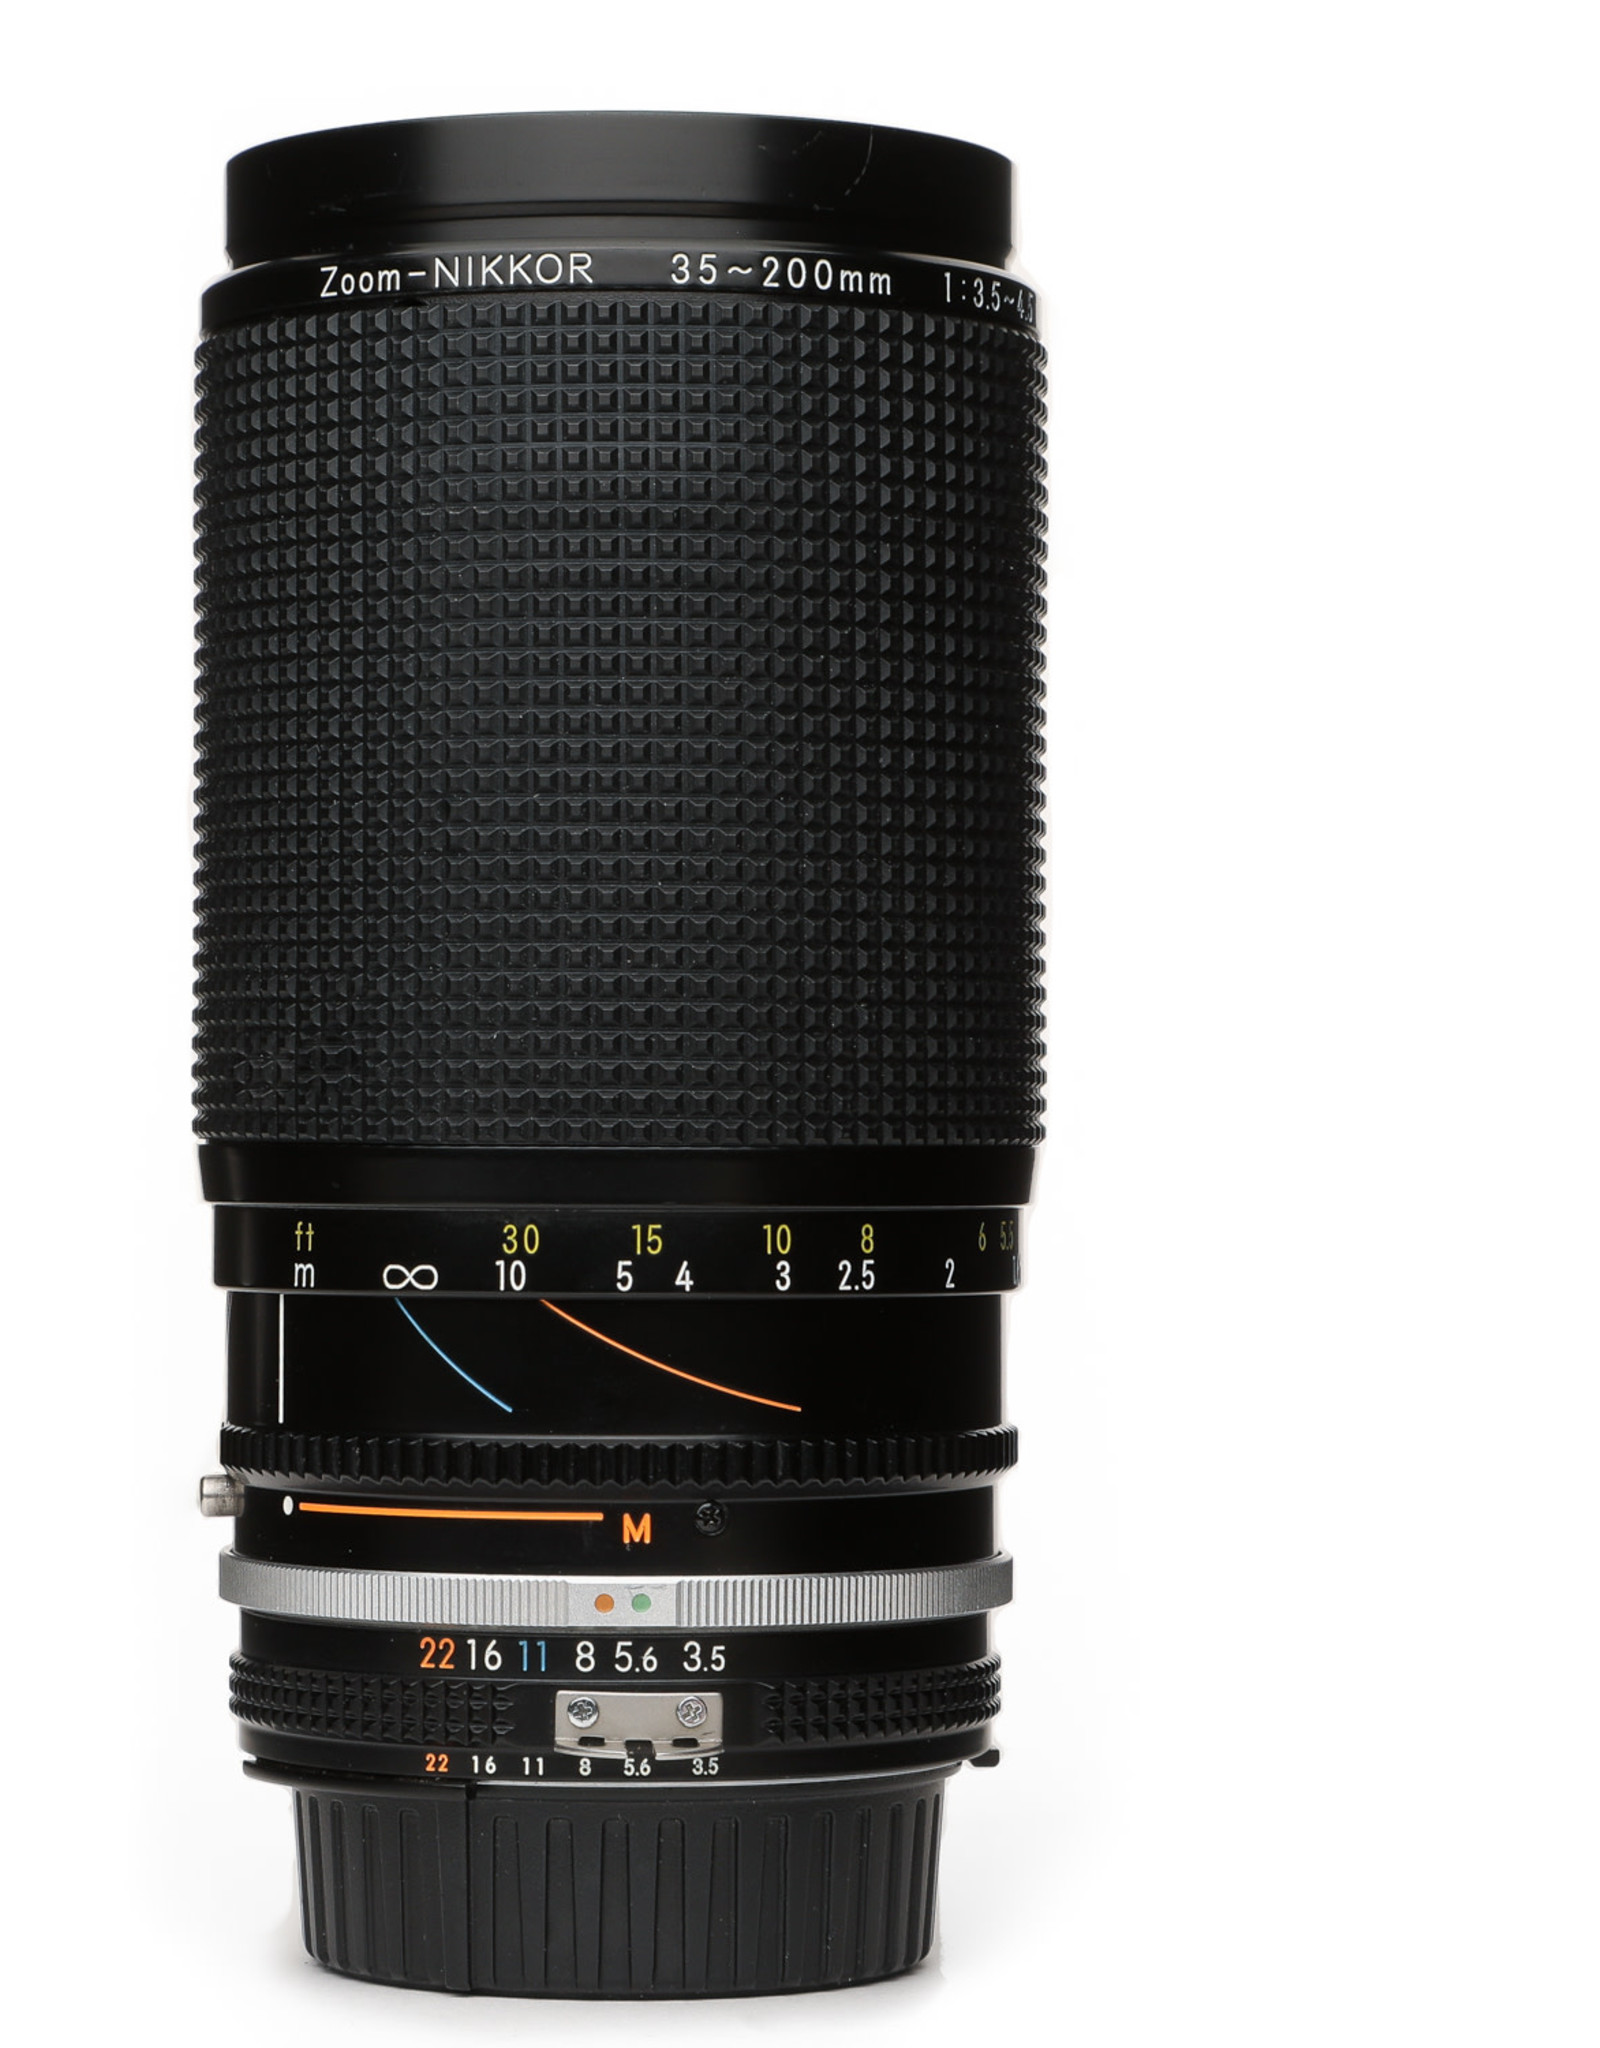 Nikon Nikon Nikkor 35-200mm F3.5-4.5 Zoom Lens